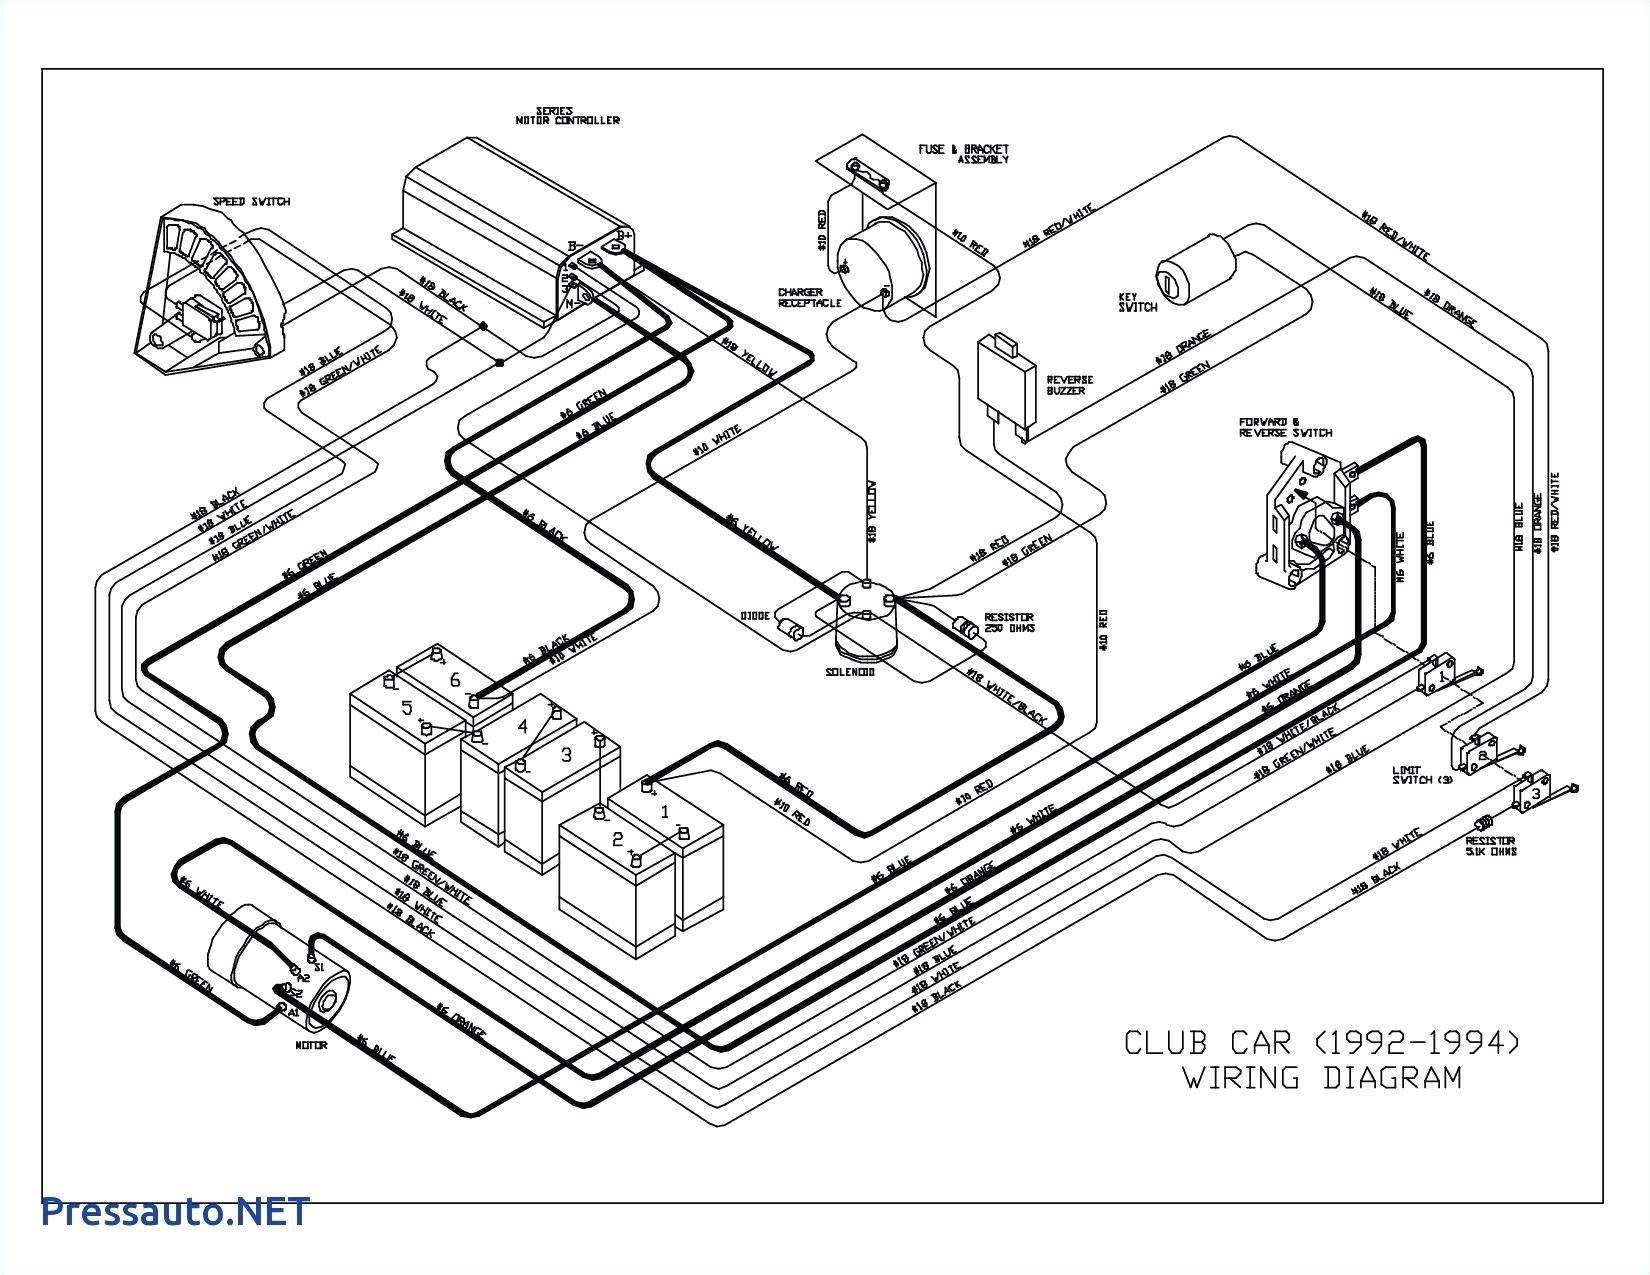 wiring diagram for 36v golf cart wiring diagram ezgo 36v wiring diagram wiring diagram blog mix